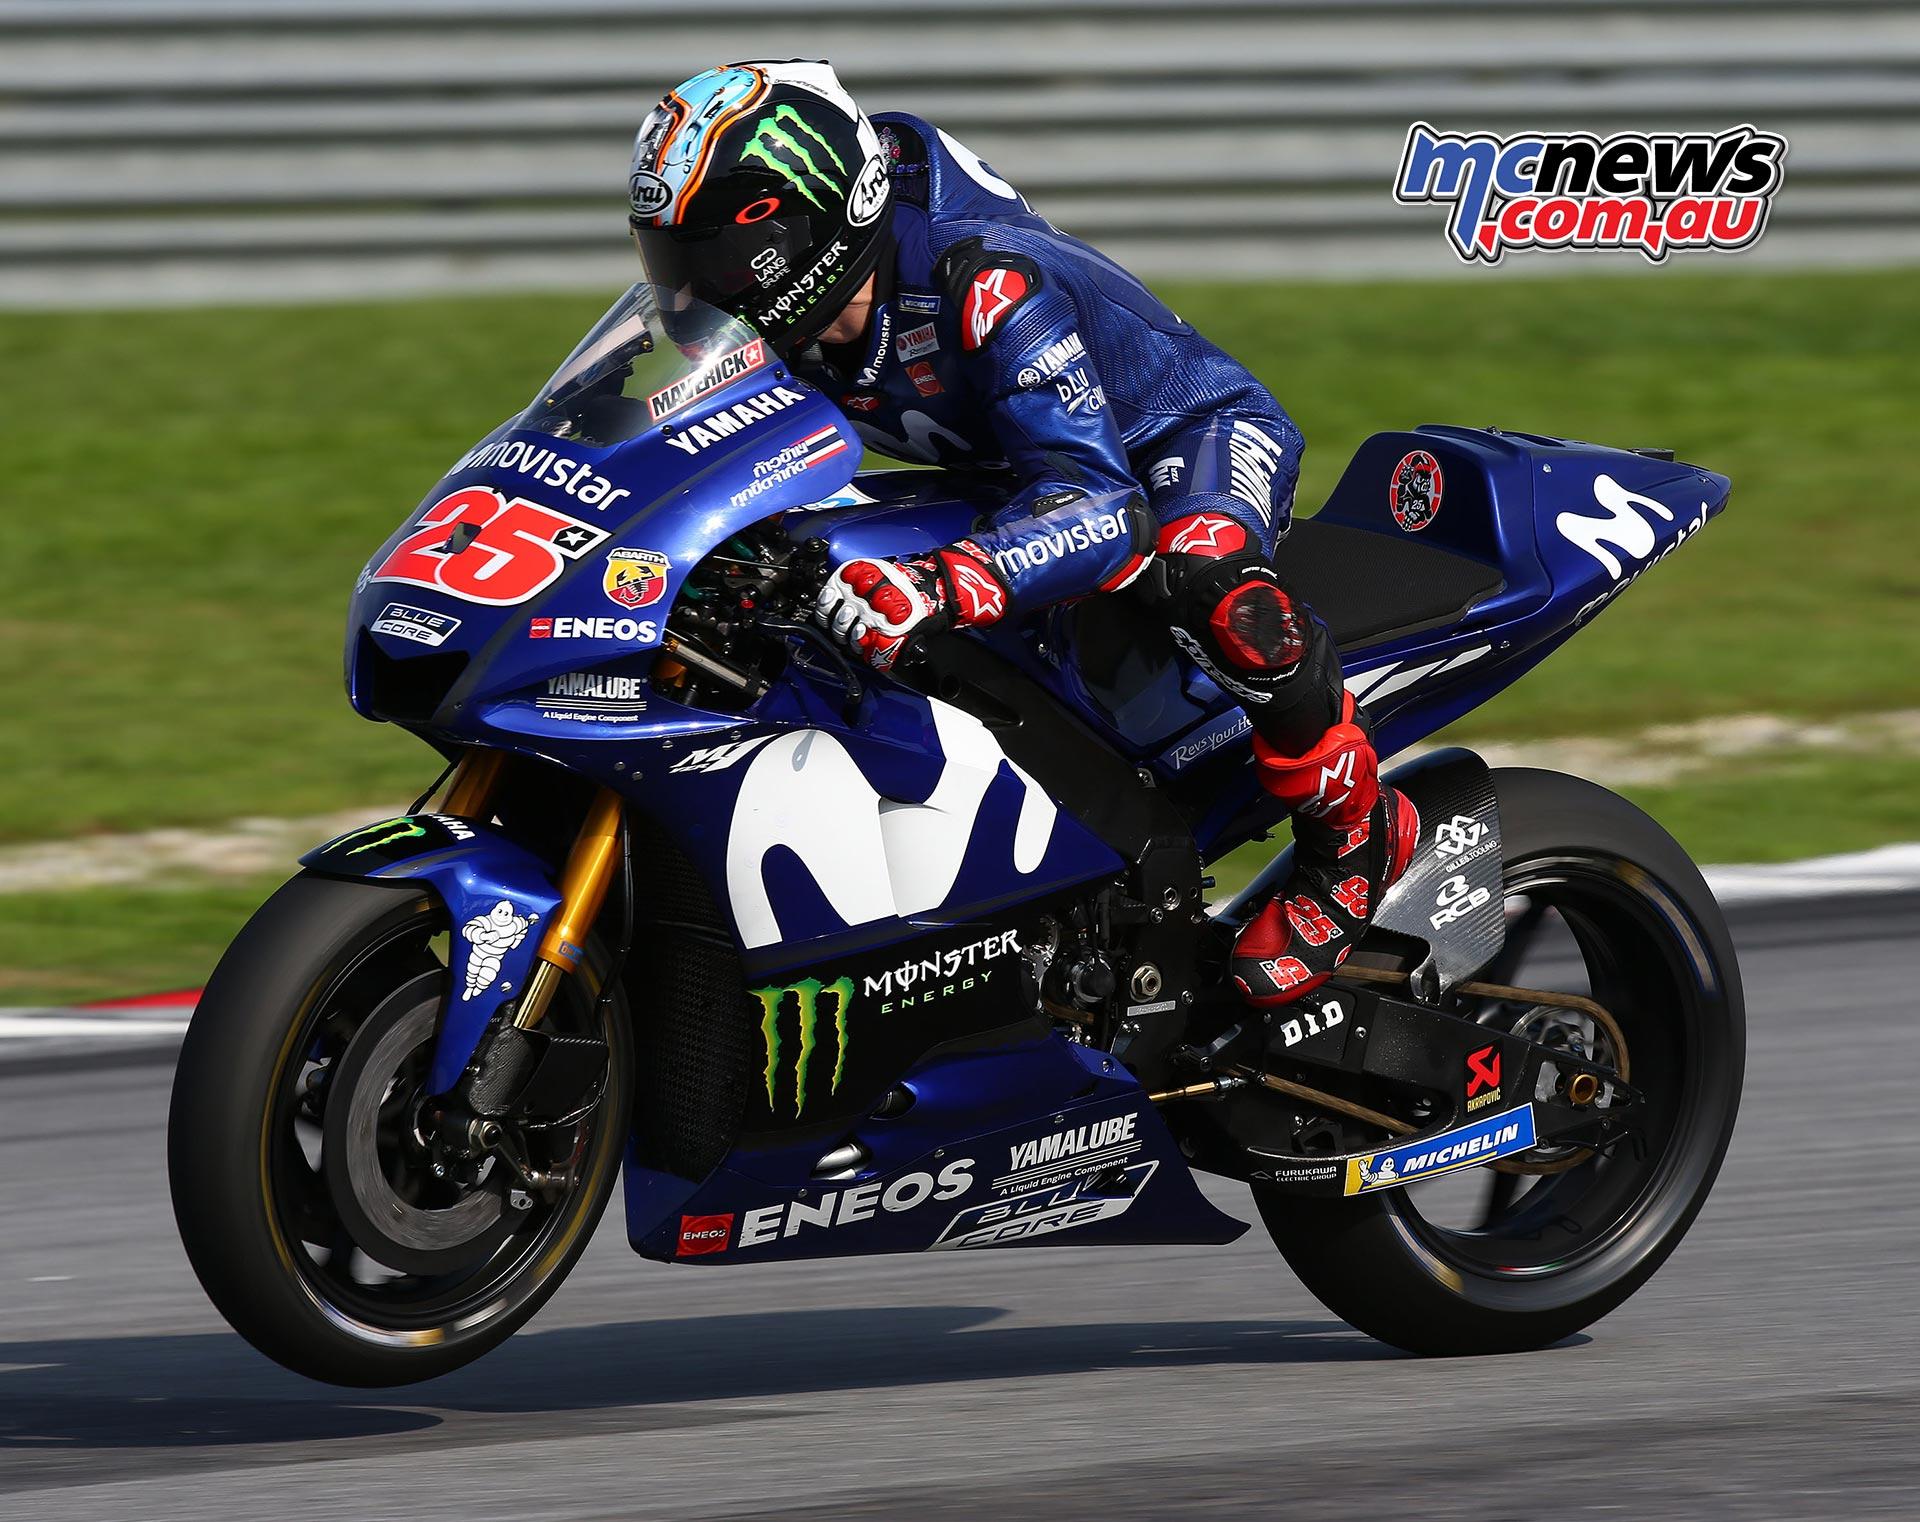 2018 Sepang MotoGP Test Images | Gallery B | MCNews.com.au